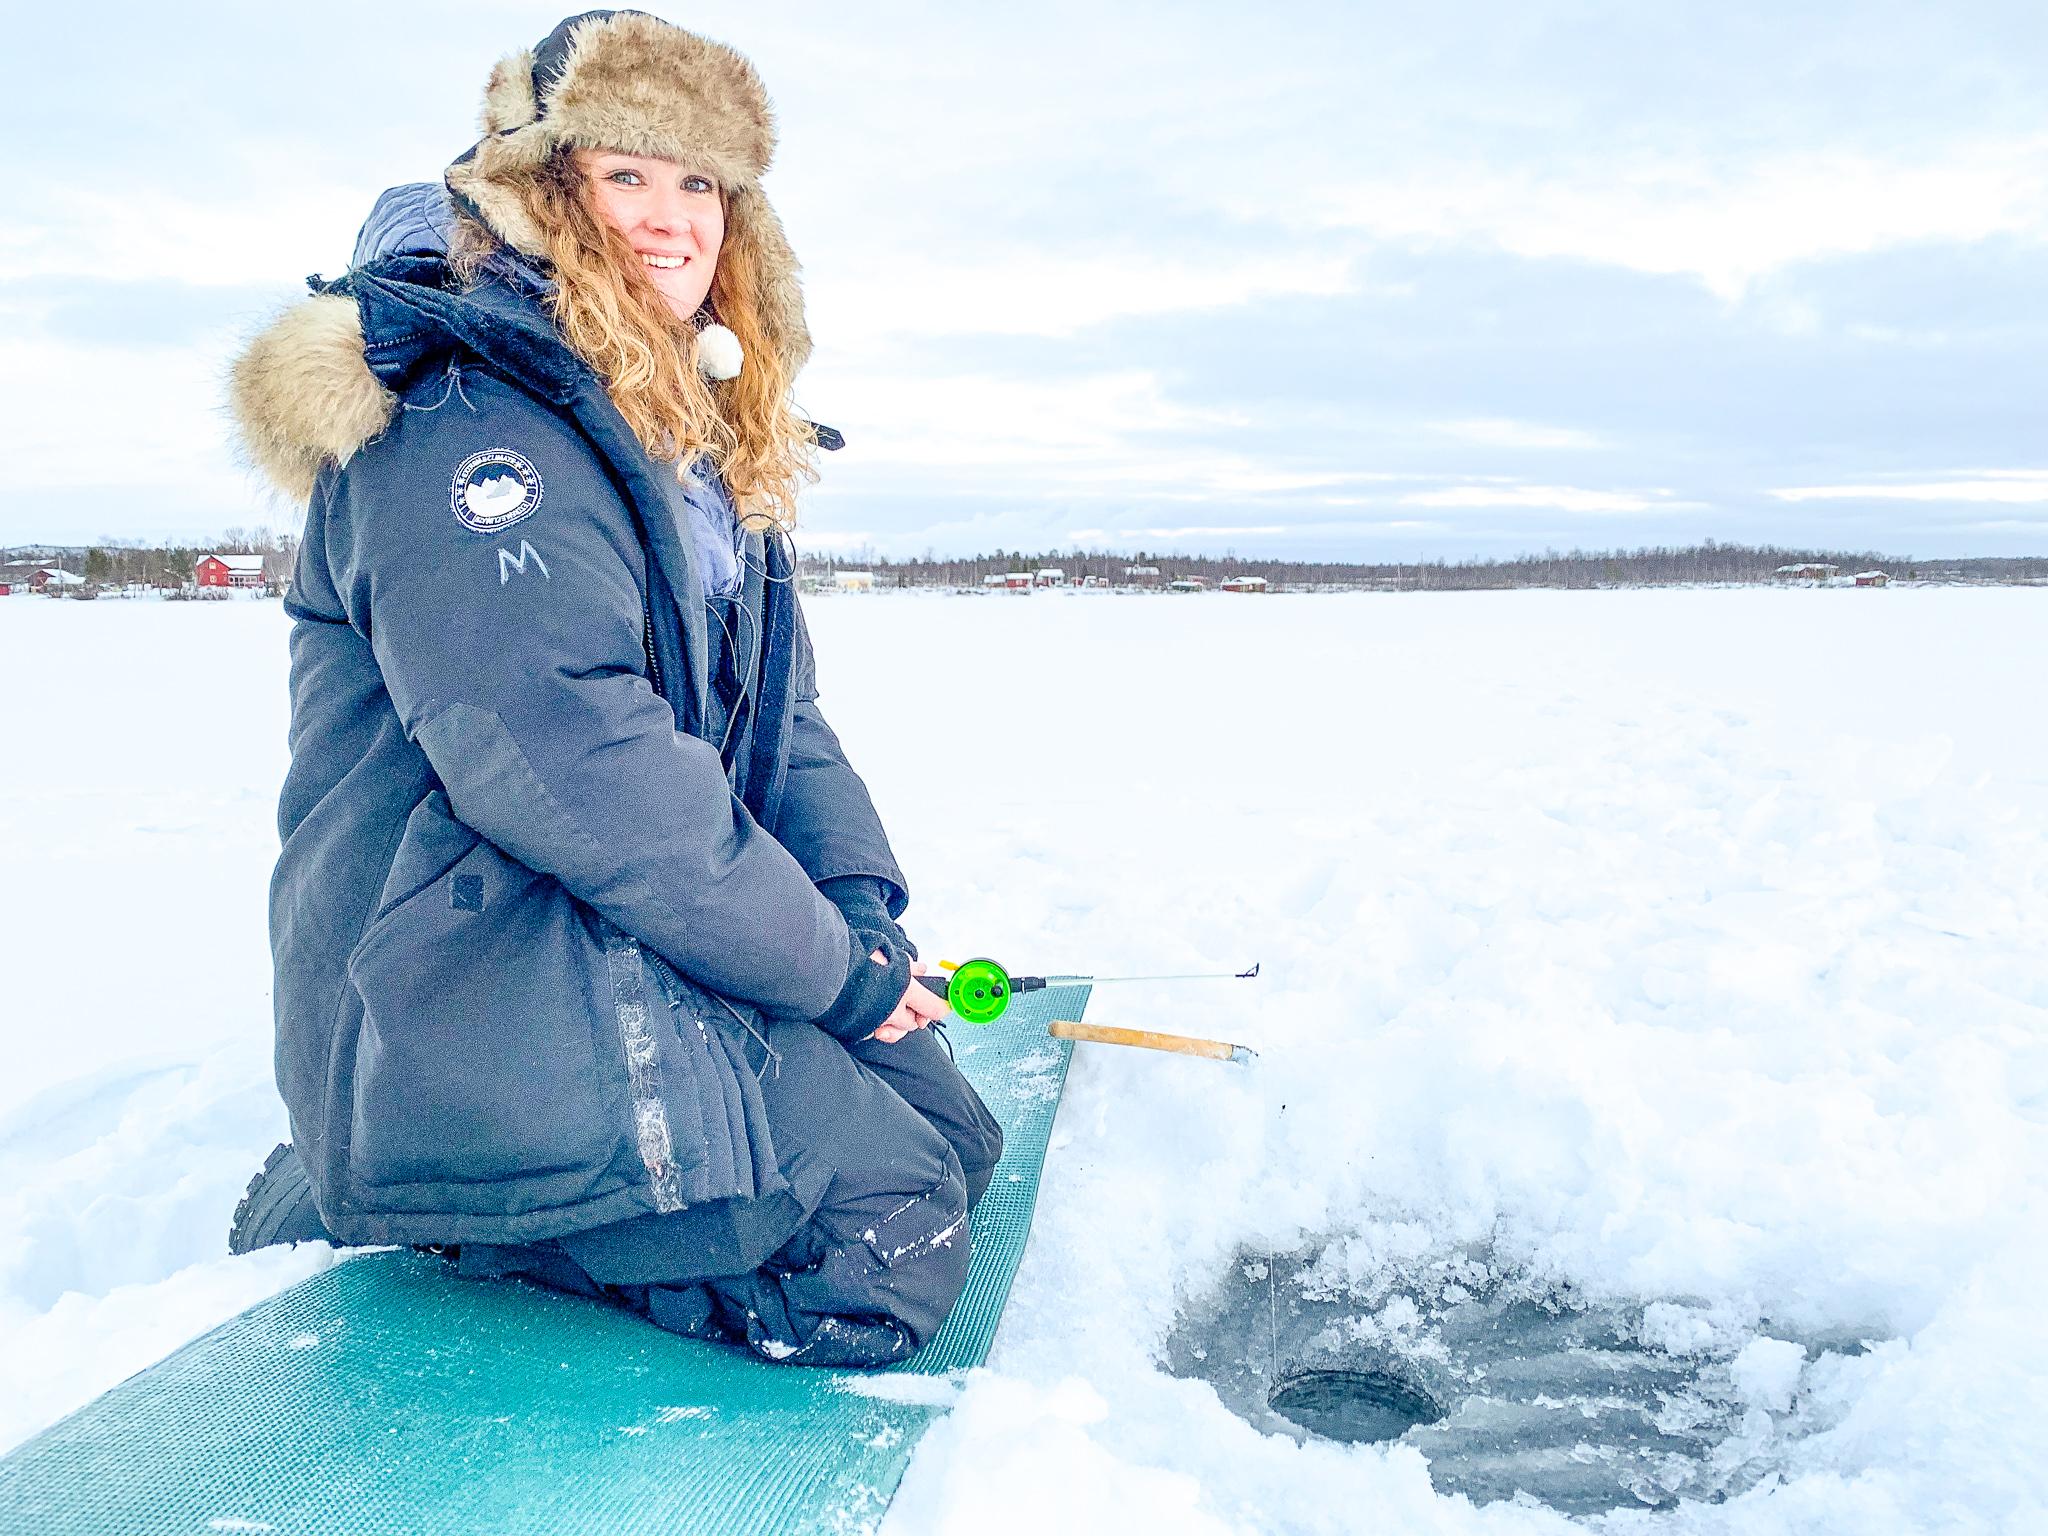 ice-fishing-sweden-lapland-2.jpg